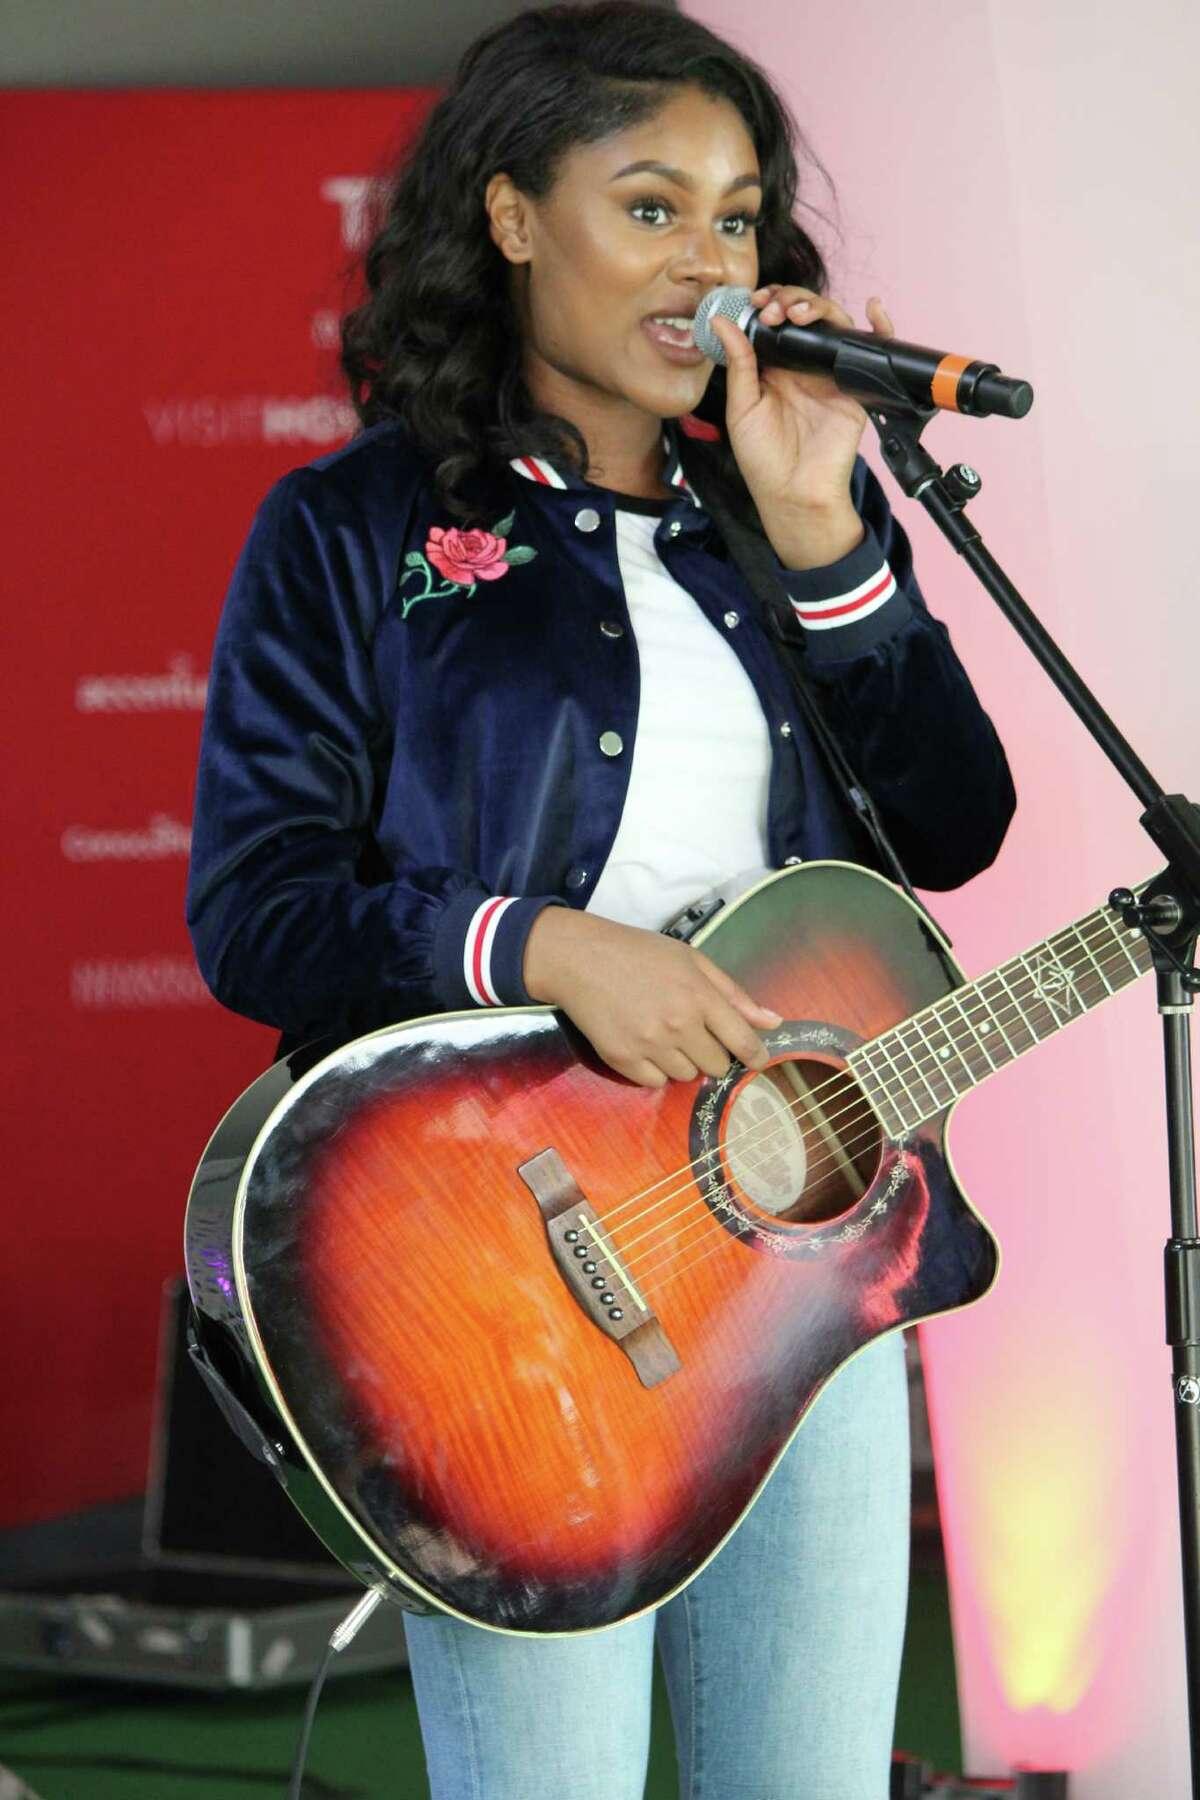 Atascocita High School Student, Vin Zeal, performing at Super Bowl Live.